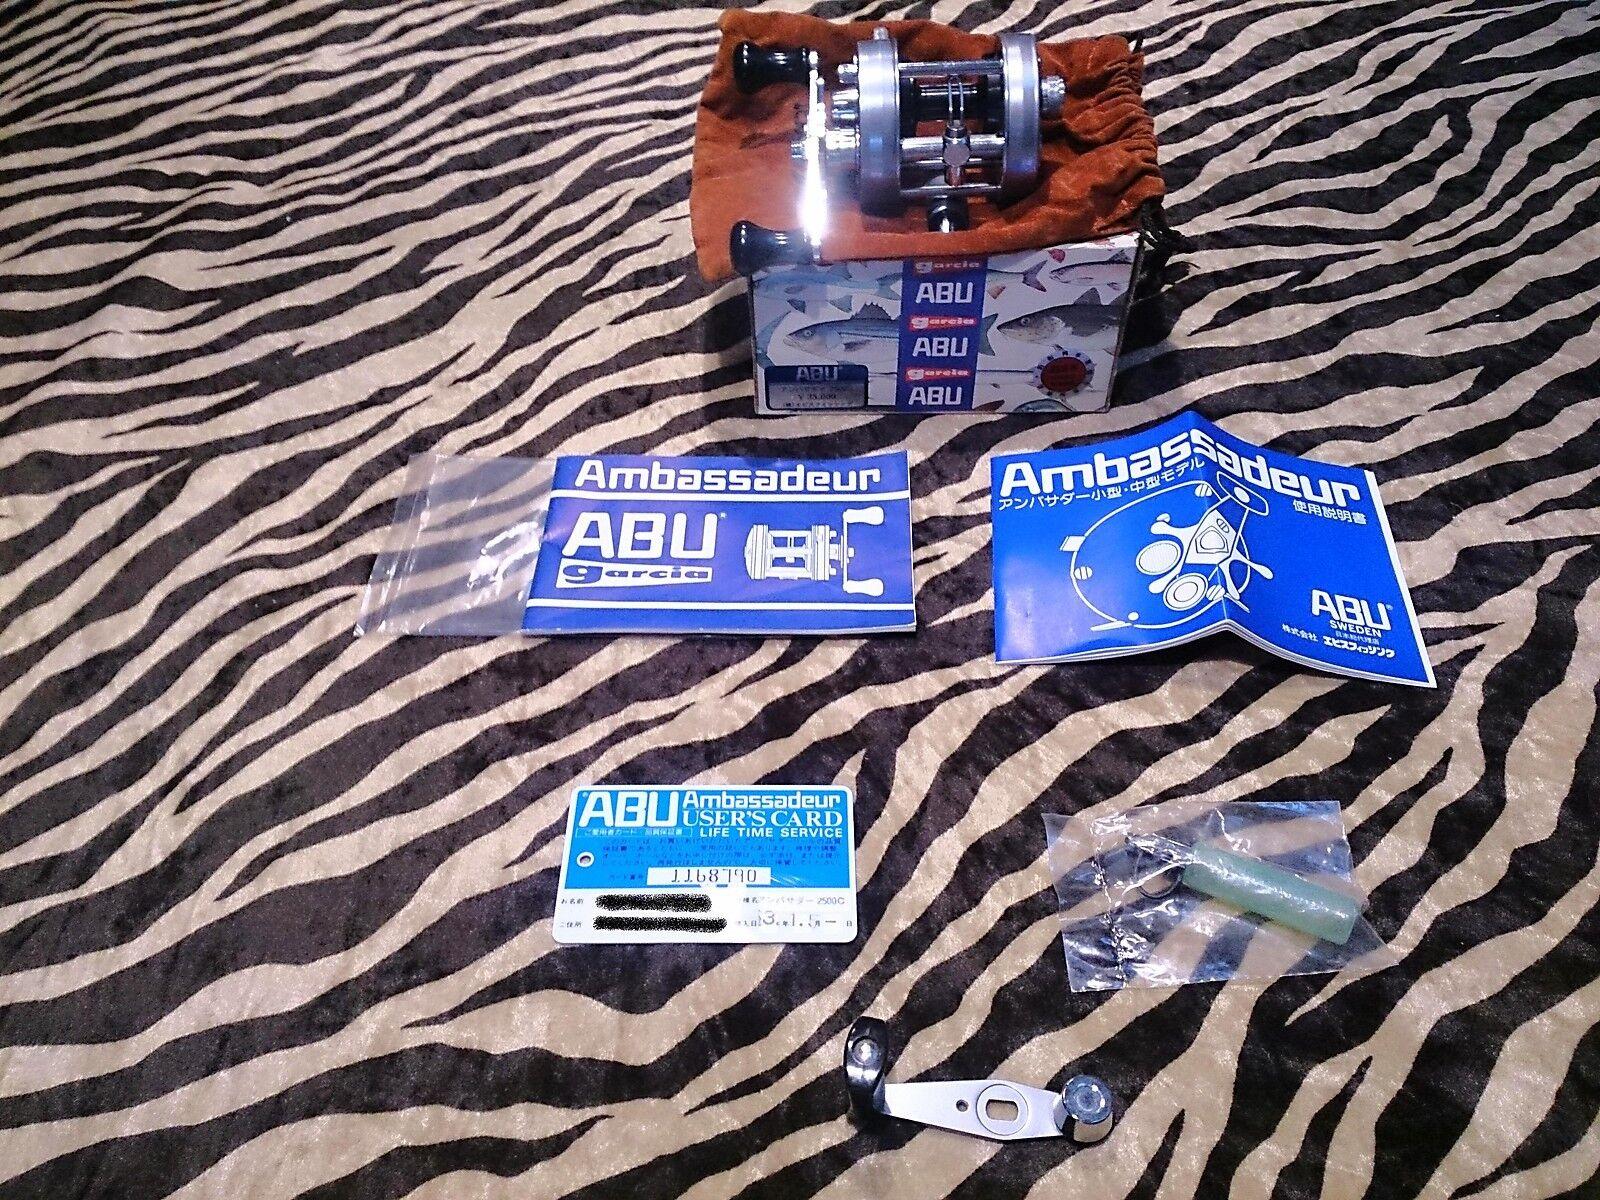 Fsg ABU Ambassadeur 2500c Baitcasting Reel Ebisu Ebisu Reel Japan w/Original box emboss d8cd8e